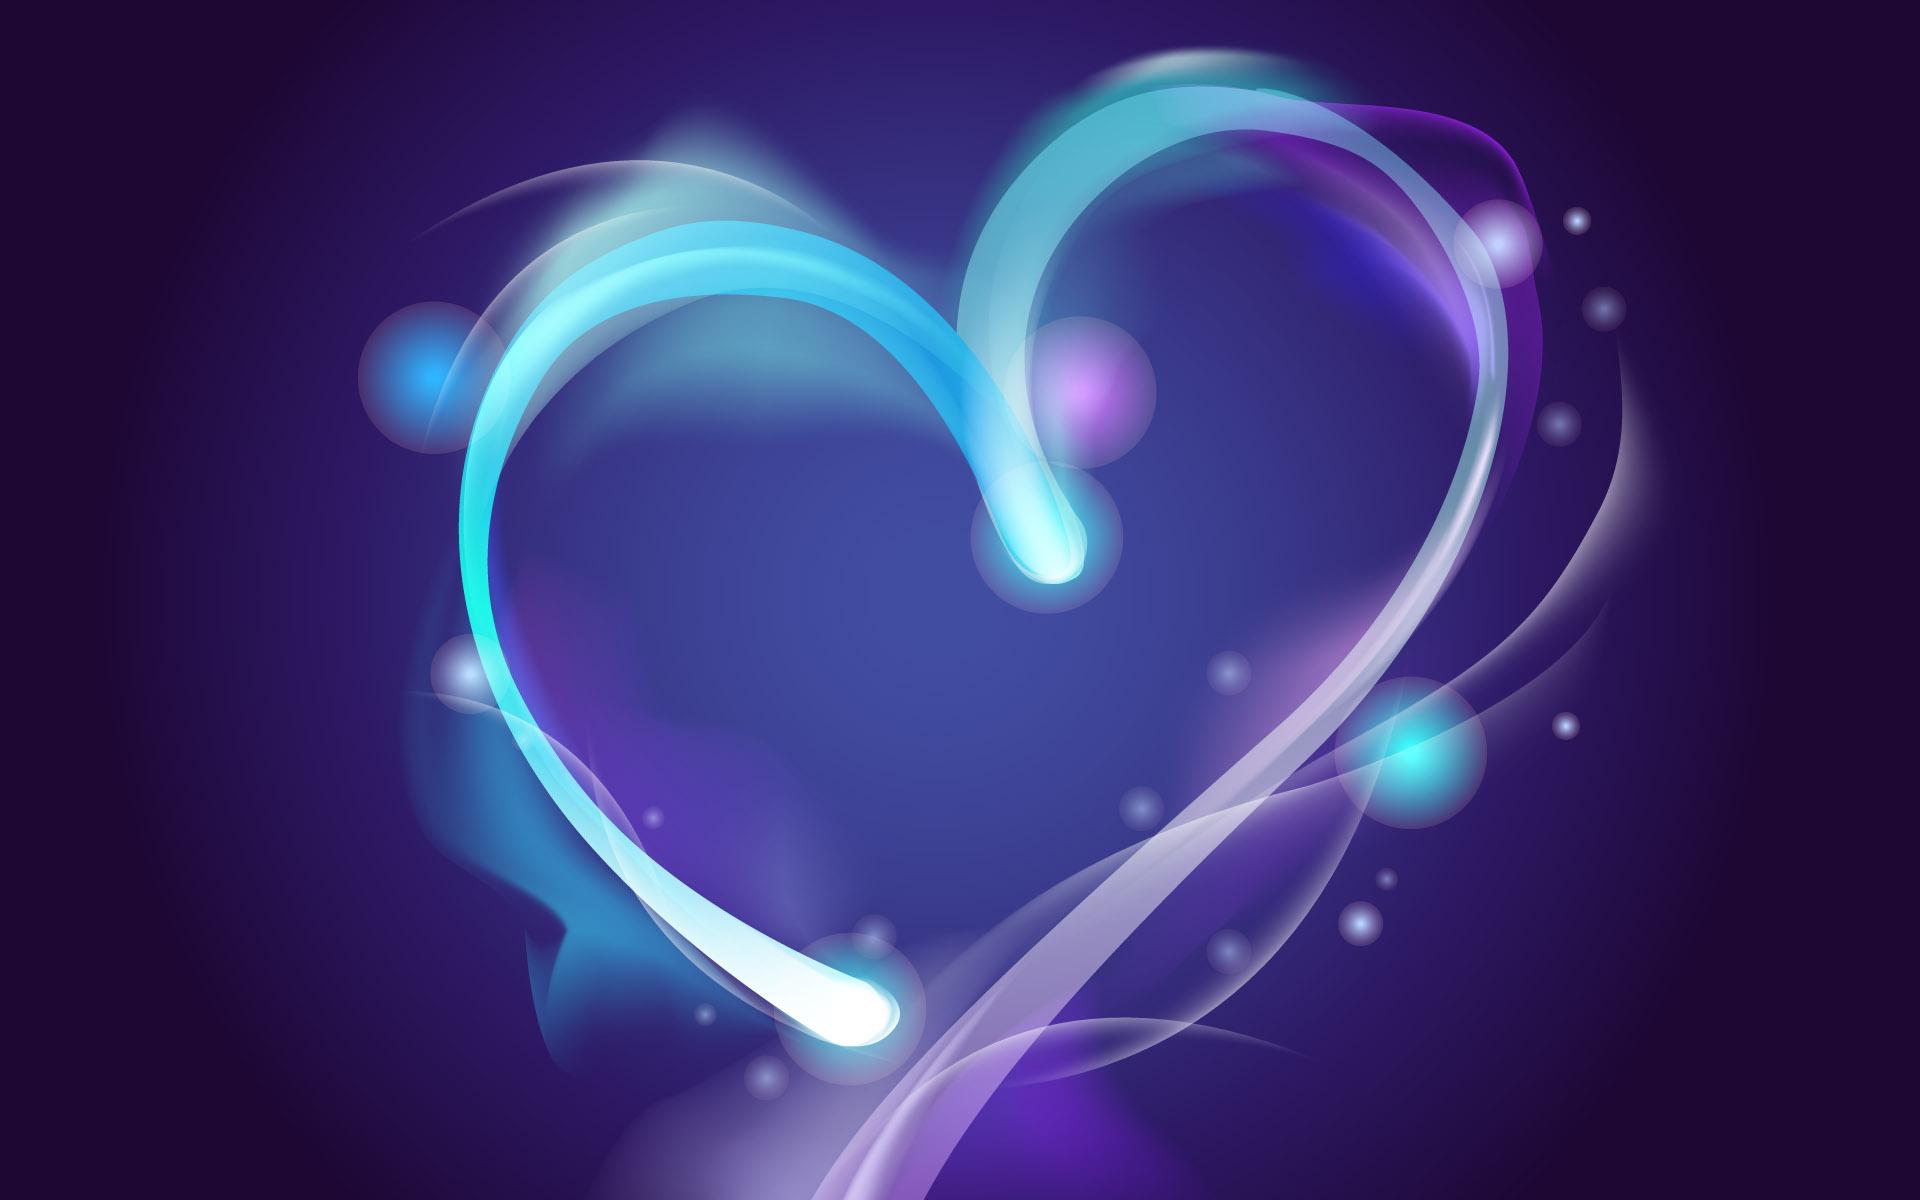 Abstract Wallpaper Black Hearts Blue 3d And Hd Wallpaper: 精美幻彩高清壁纸_描绘呐颗心_QQ下载网